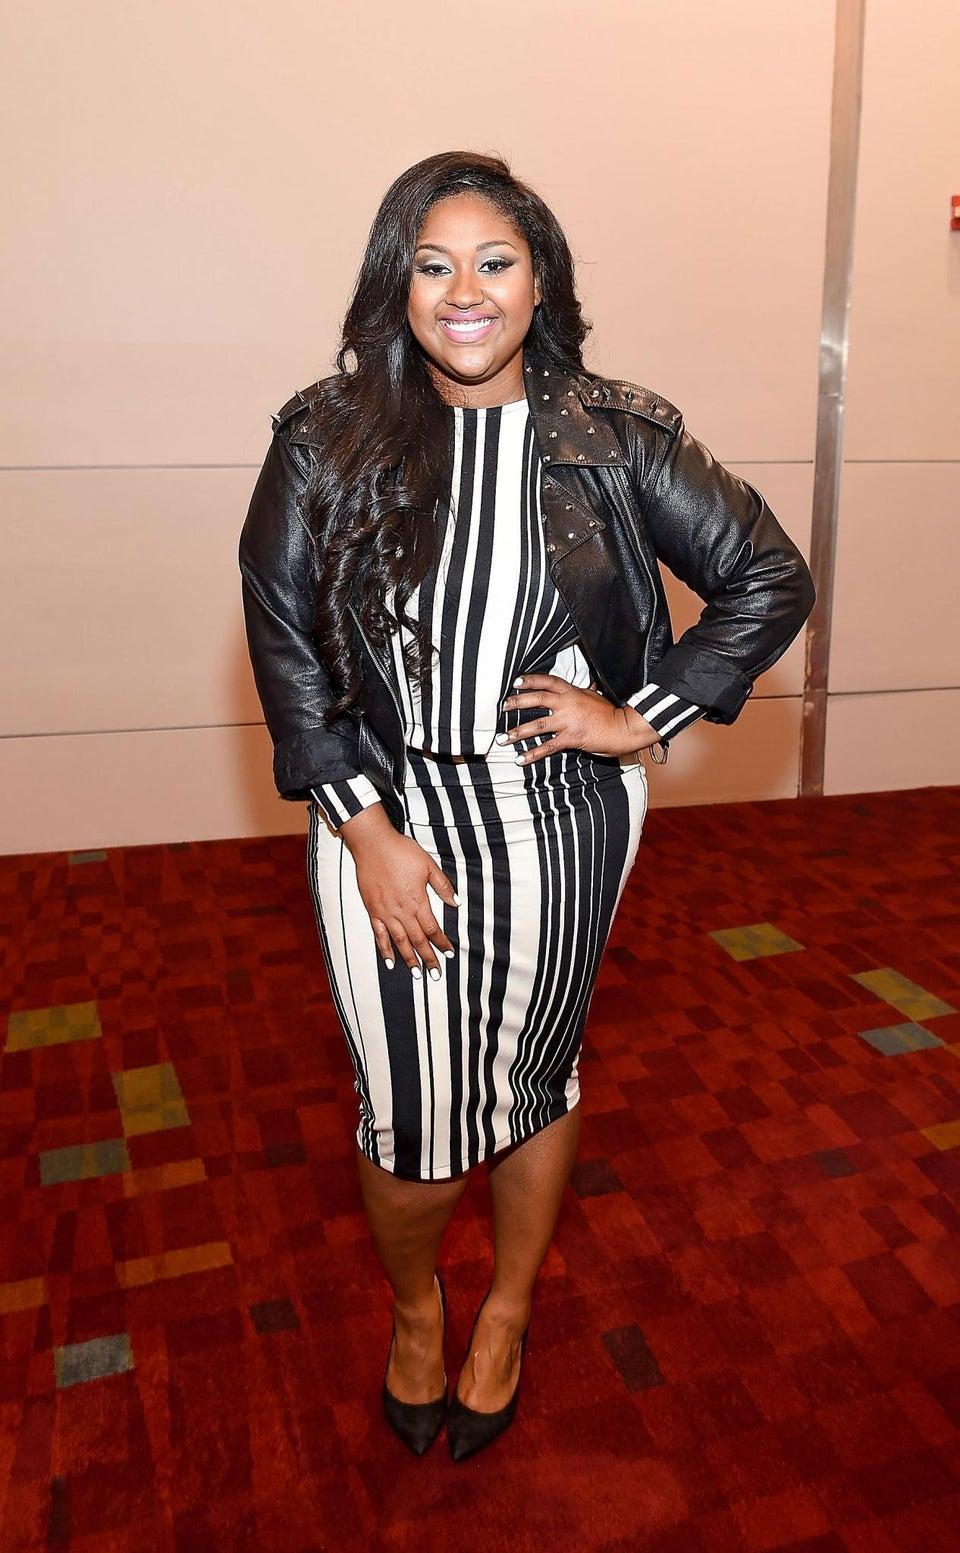 Jazmine Sullivan on Her Weight: 'I'm Big! Now Carry On'